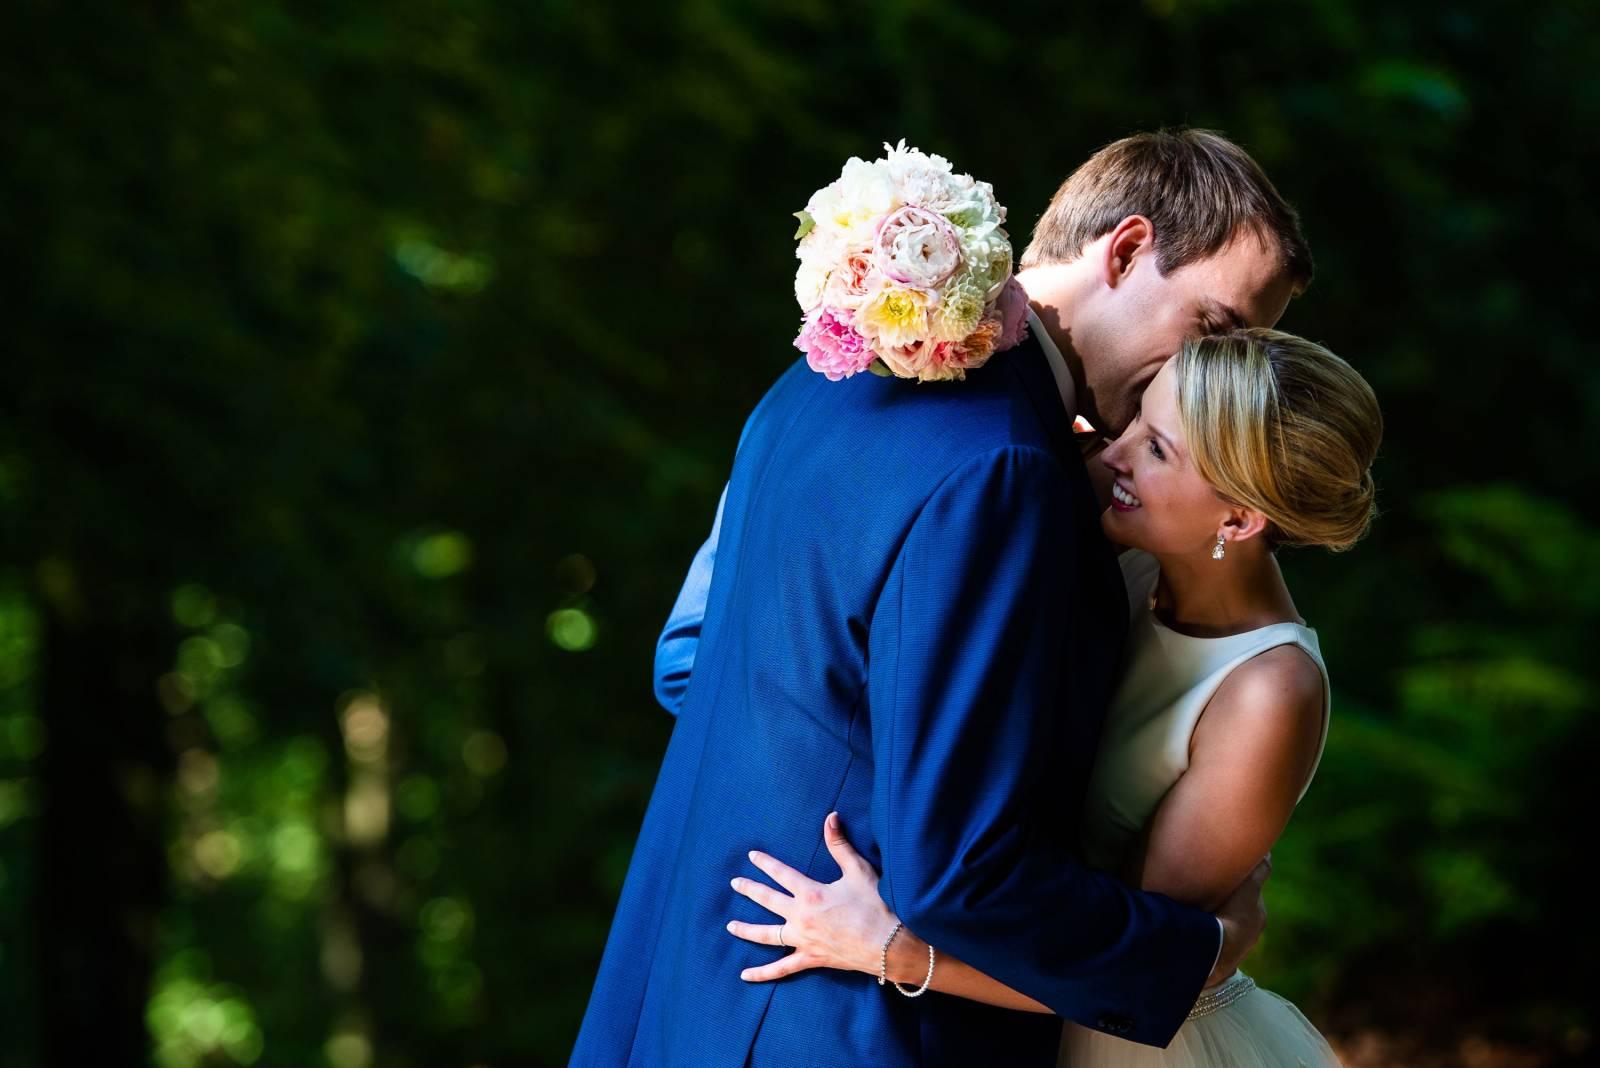 Lauren Bracke - Bruidsmake-up - House of Weddings - 17